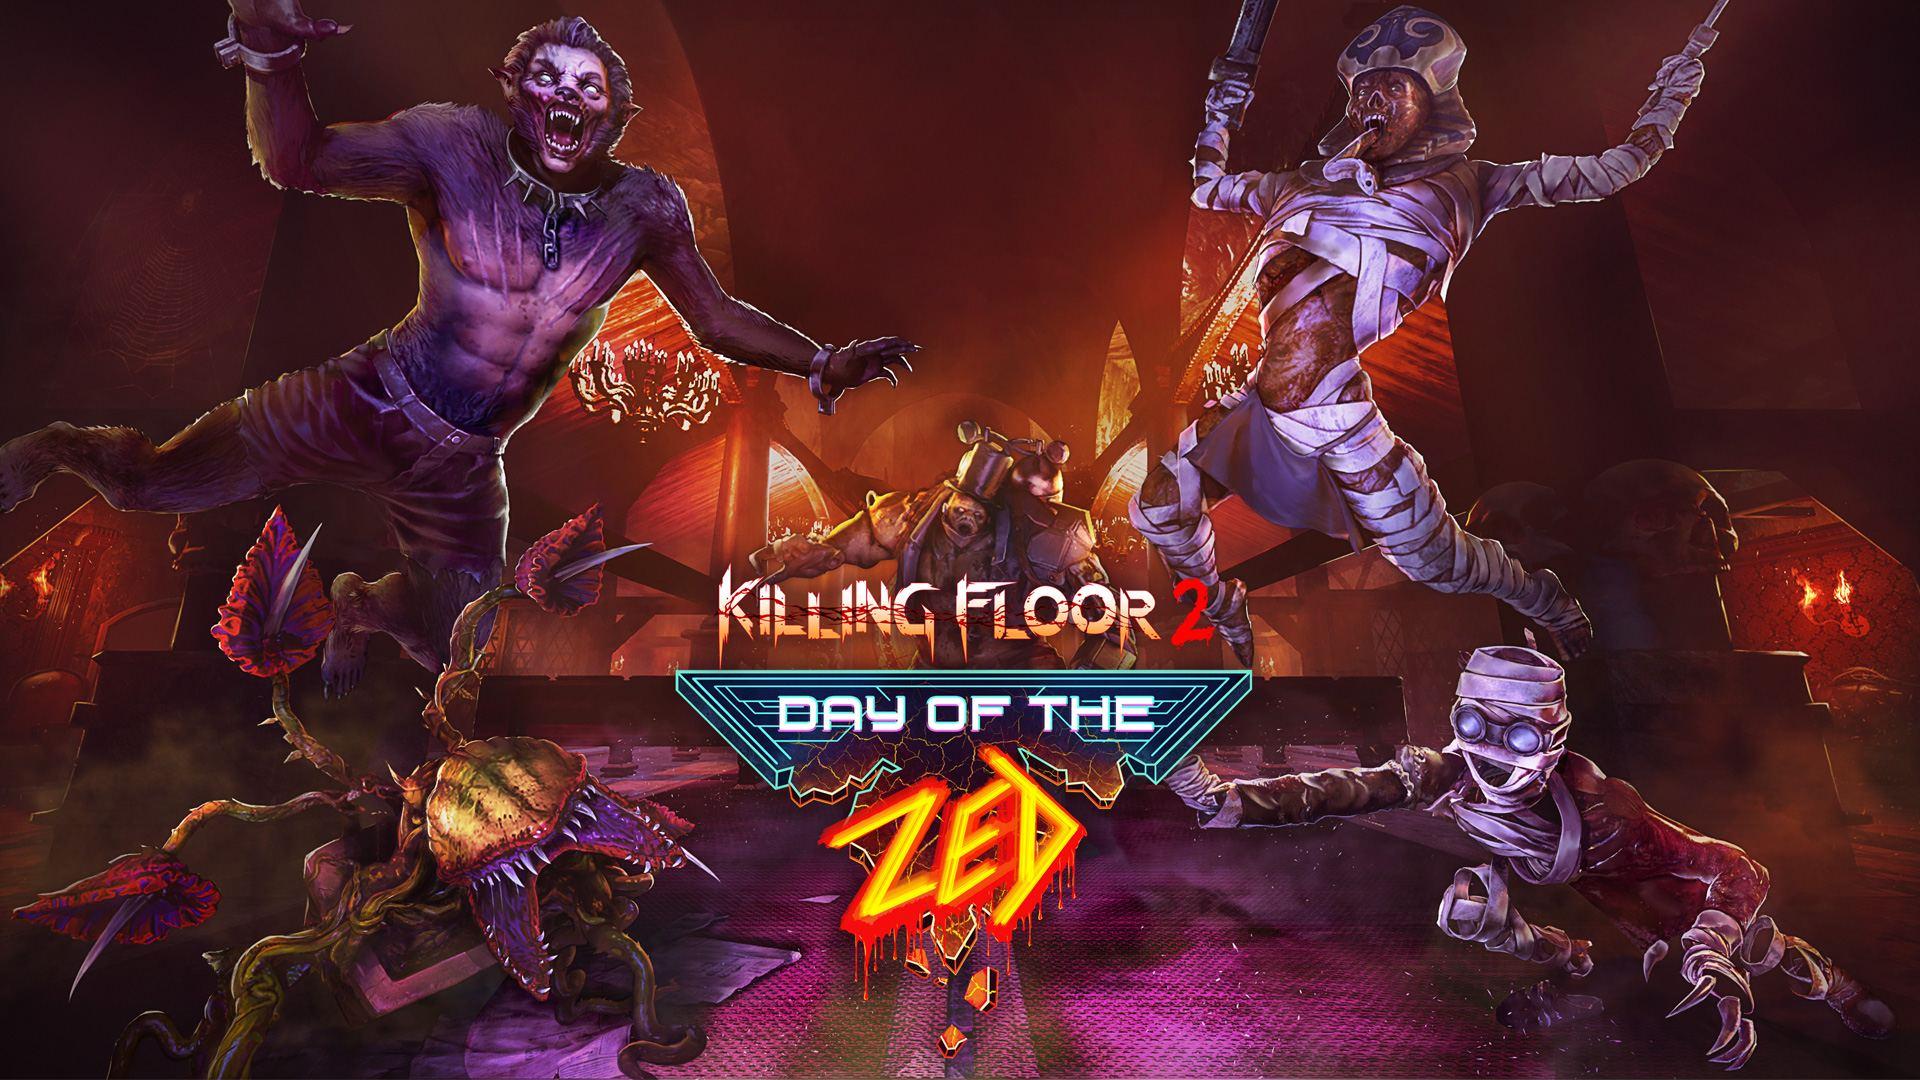 Killing Floor 2 - Day of the Zed - key art | Tripwire Interactive